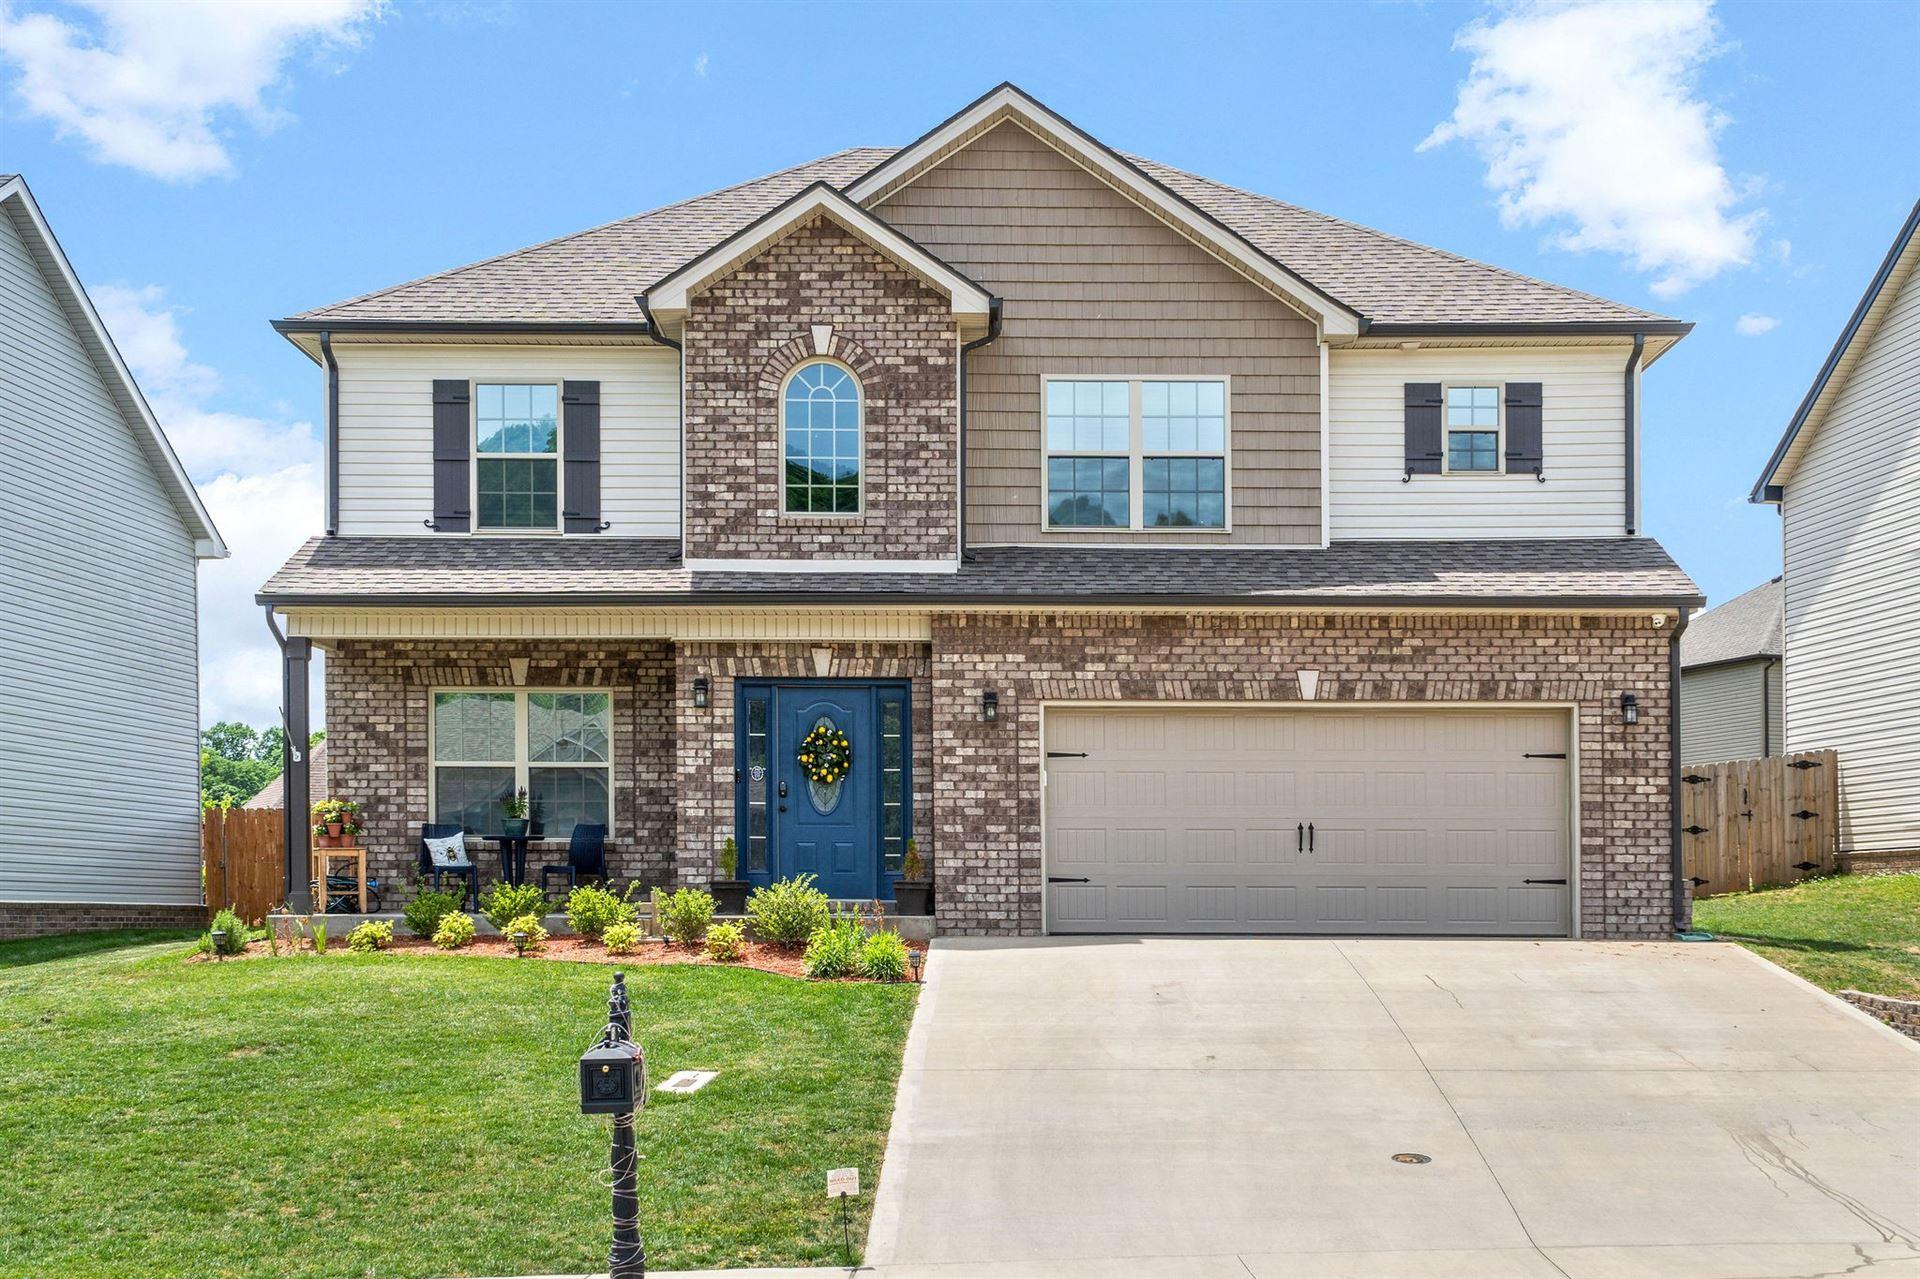 1554 Raven Rd, Clarksville, TN 37042 - MLS#: 2260478